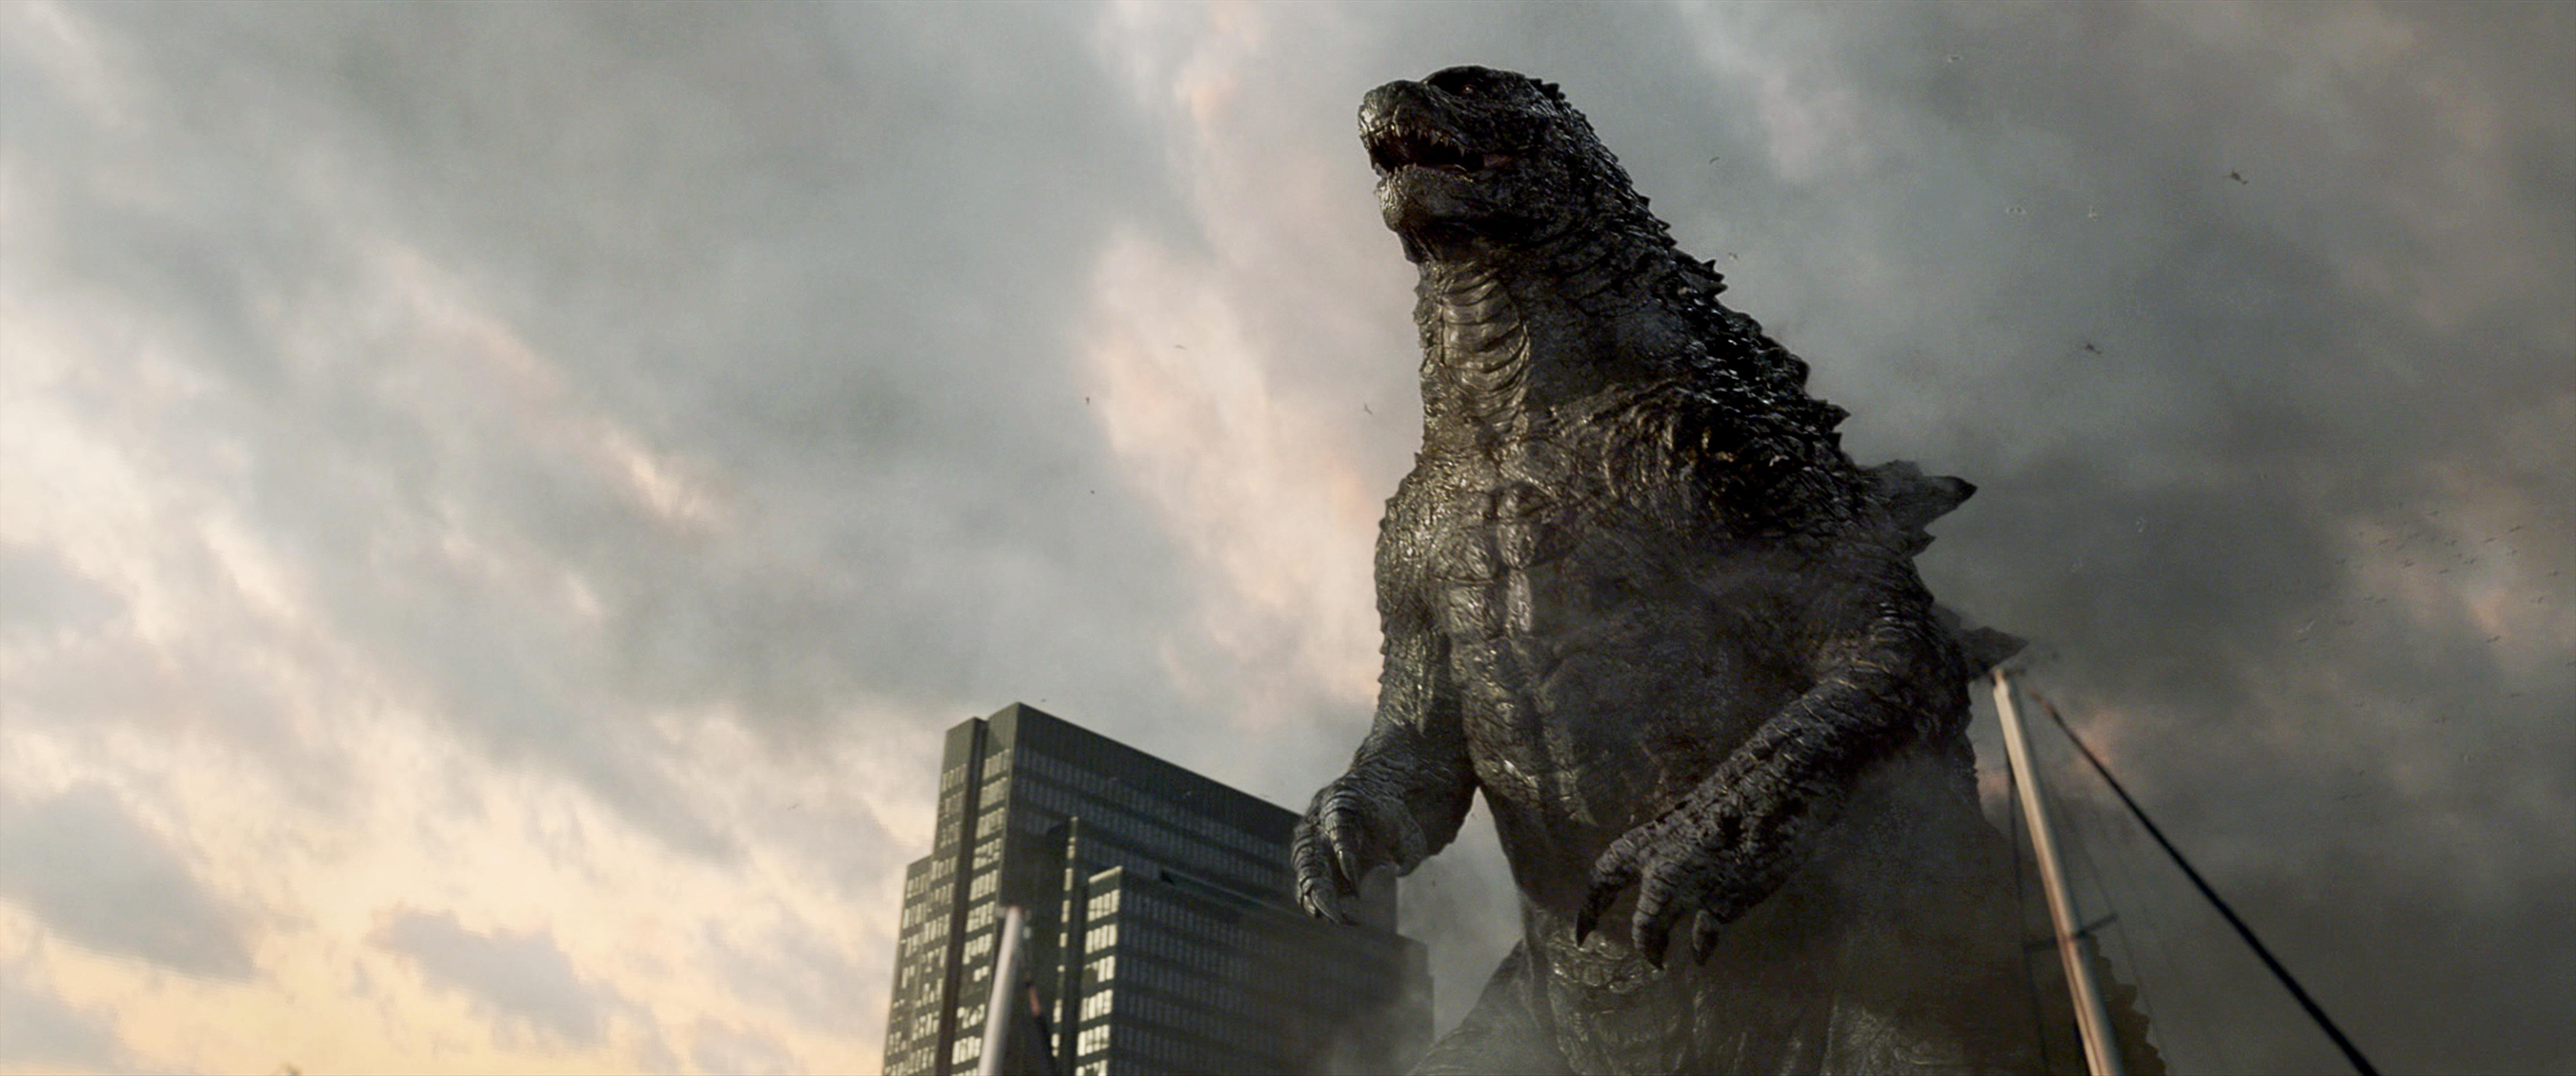 Godzilla (2014) - HD các bức ảnh